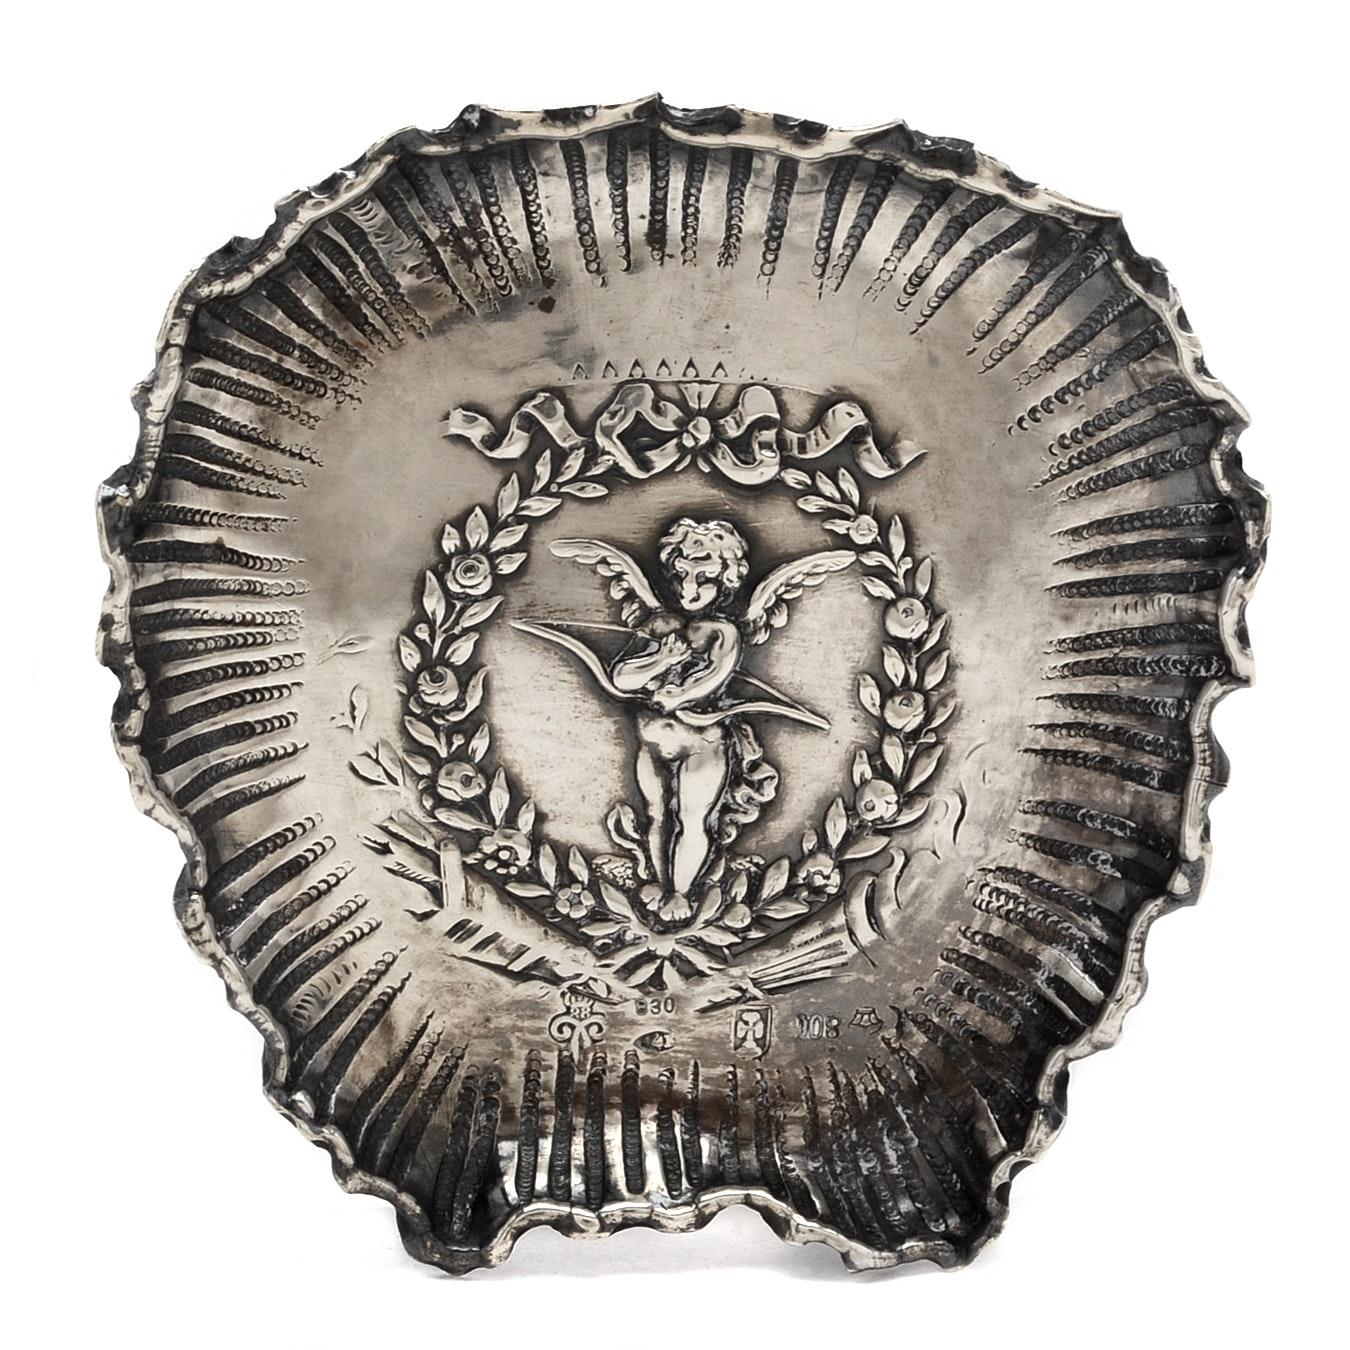 800 Silver Dish with Cherub Motif